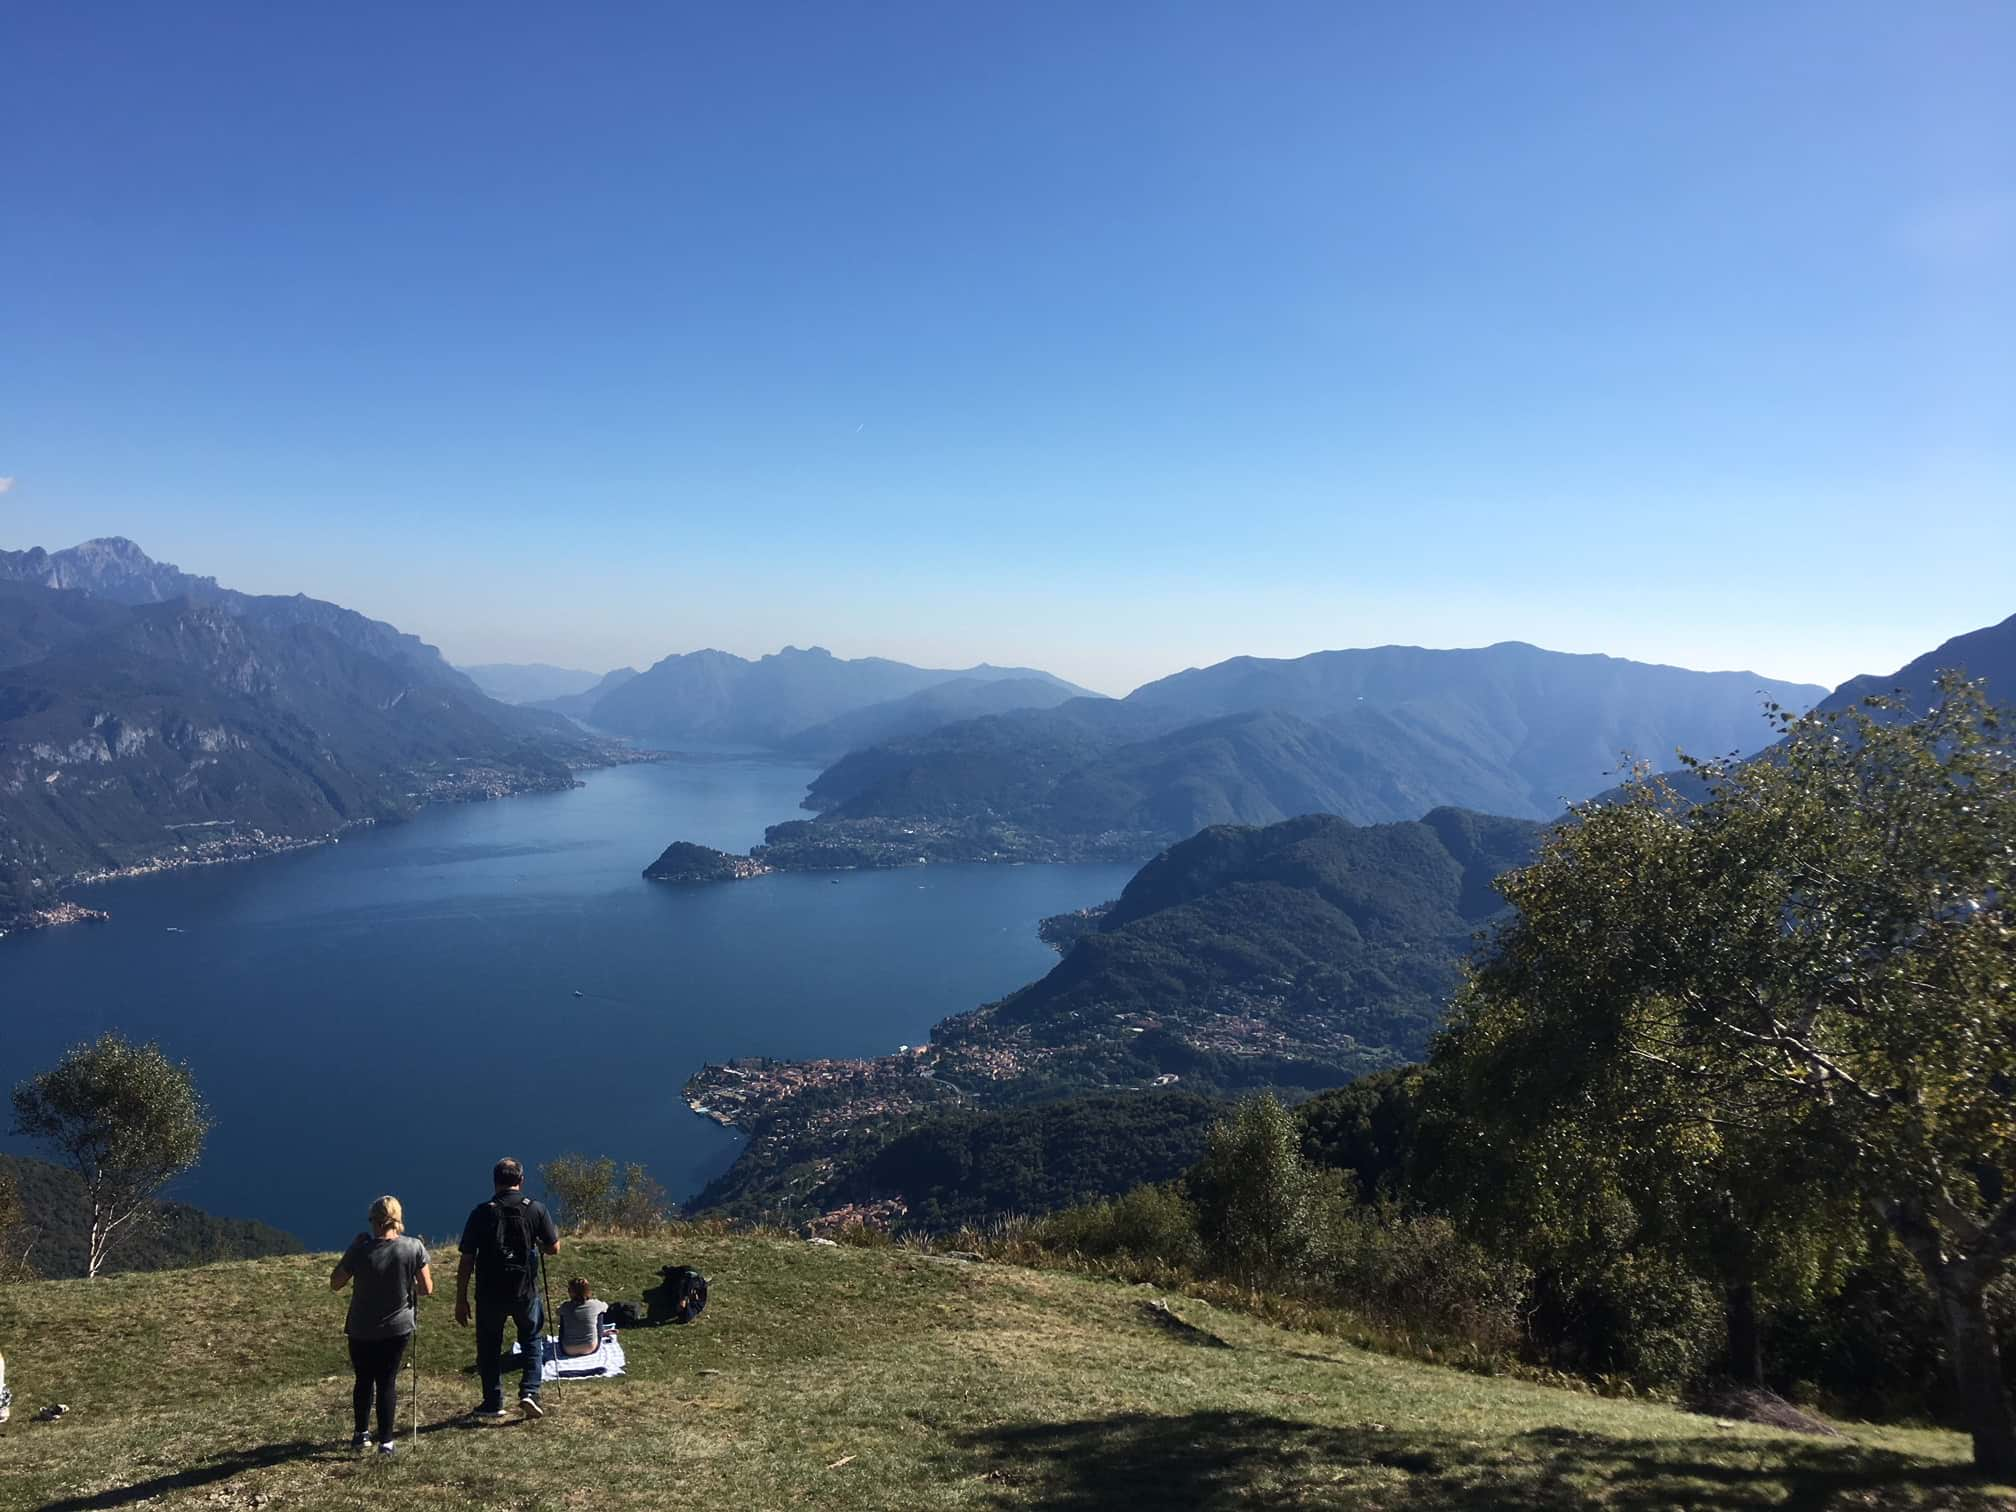 Hikingcomolake_RifugioMenaggio (2) LR.jpg